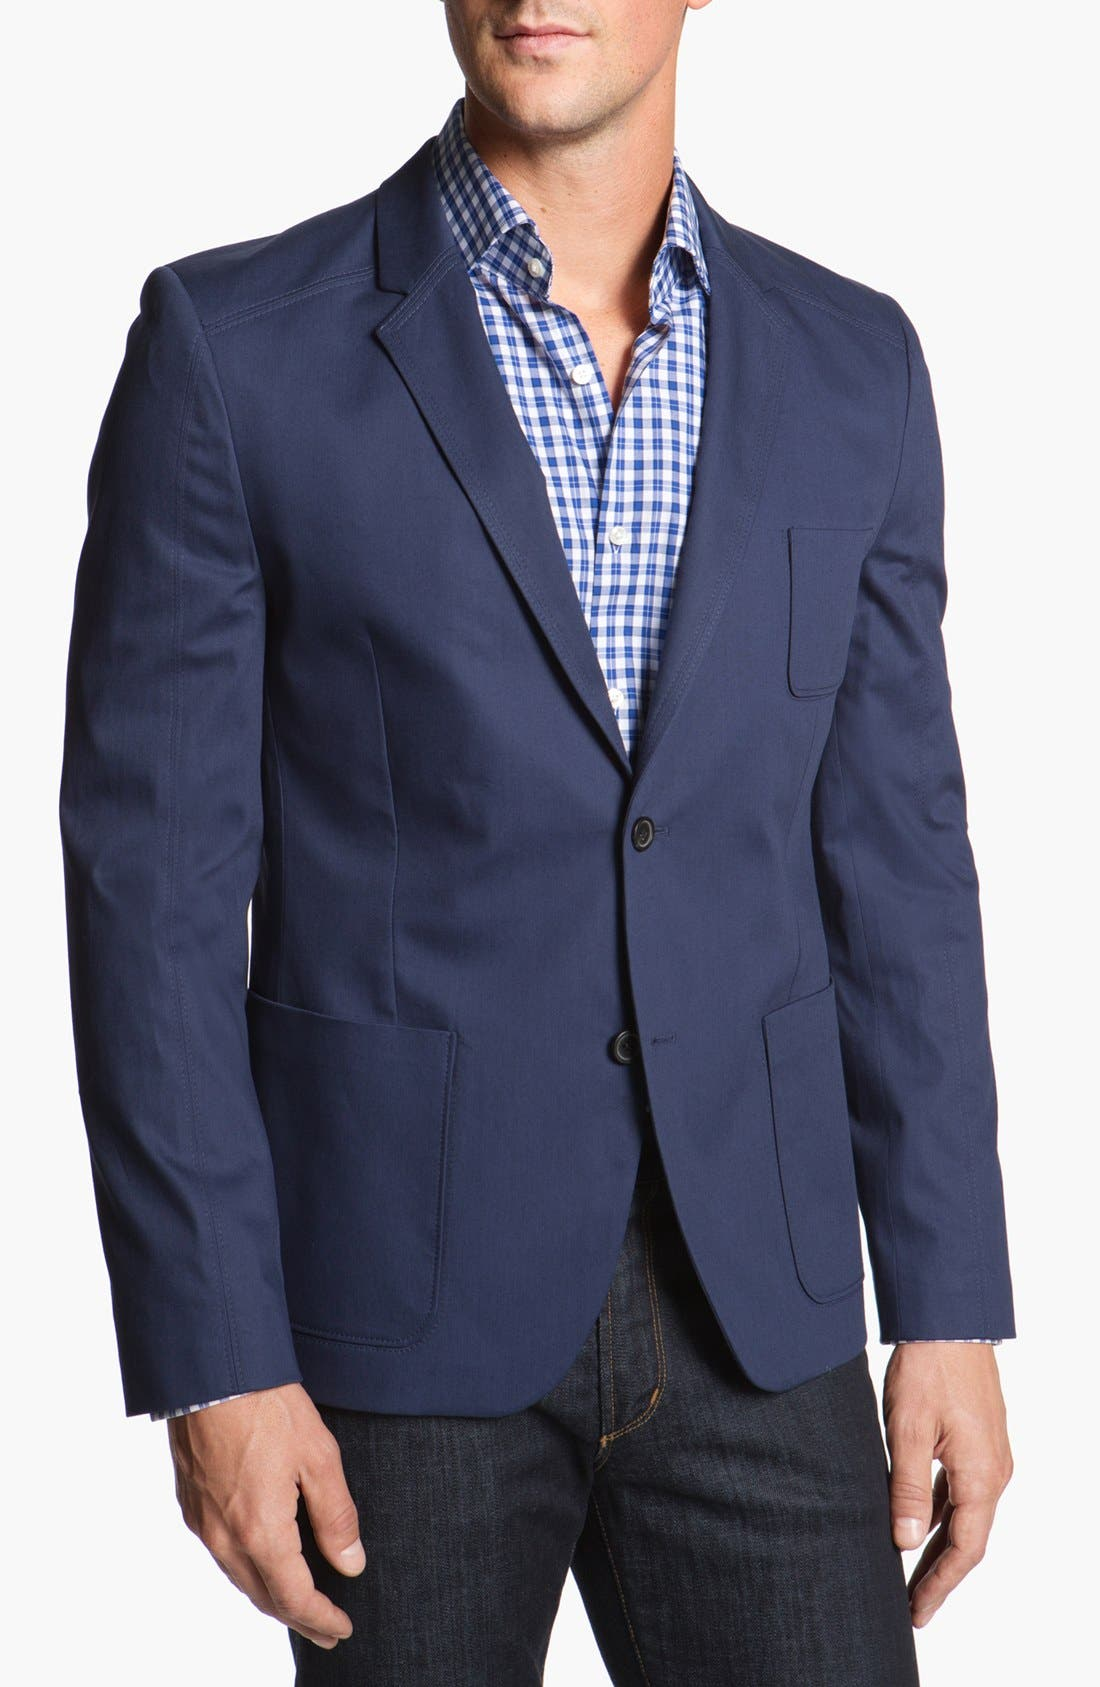 Alternate Image 1 Selected - HUGO 'Antero' Sportcoat